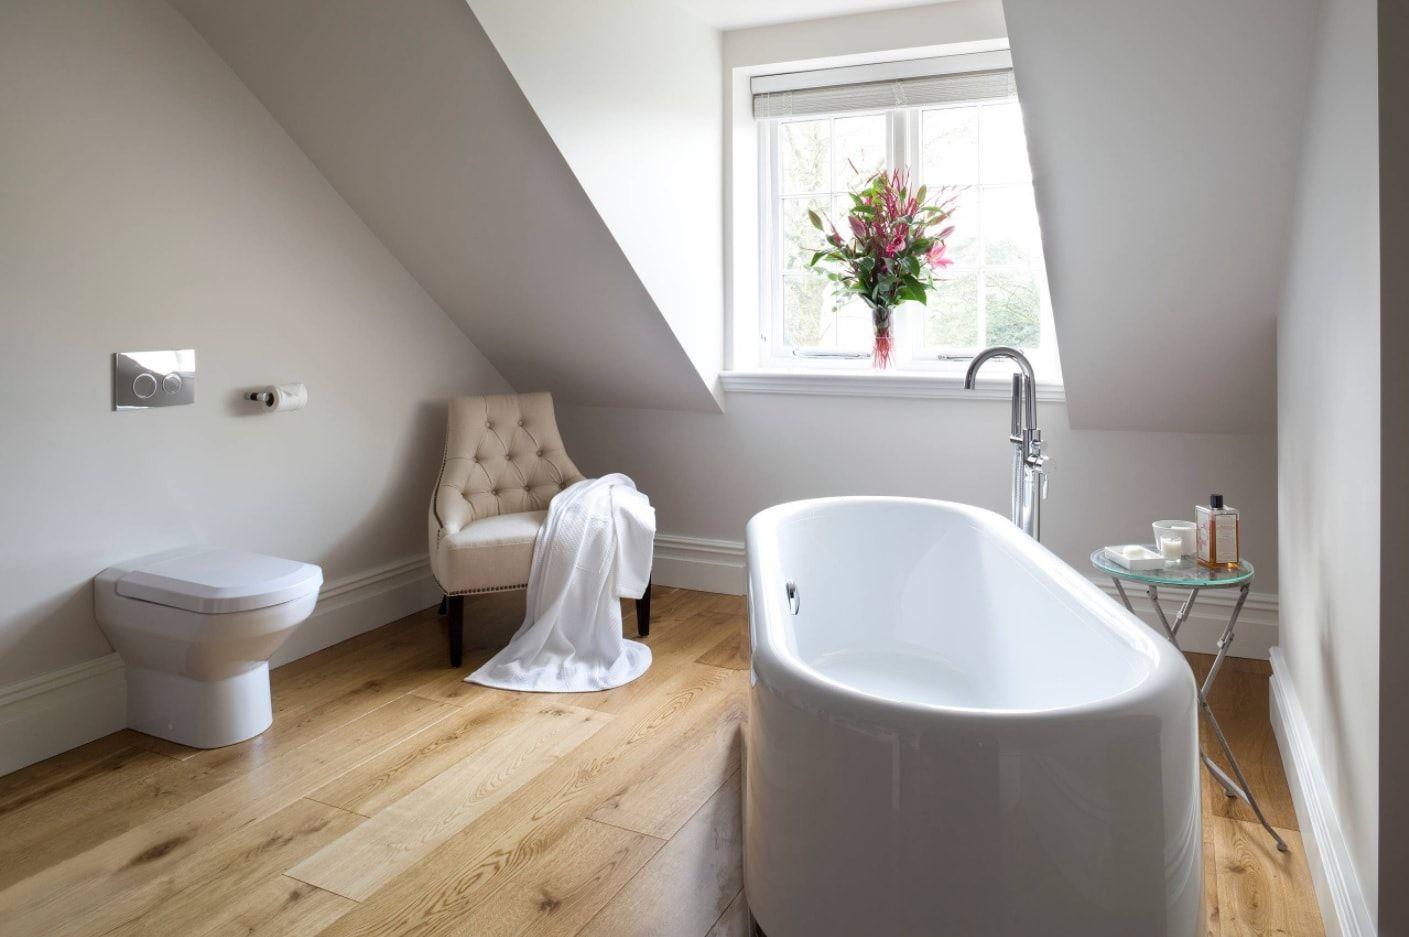 Modern and Loft designed bathroom with white stone oval bathtub